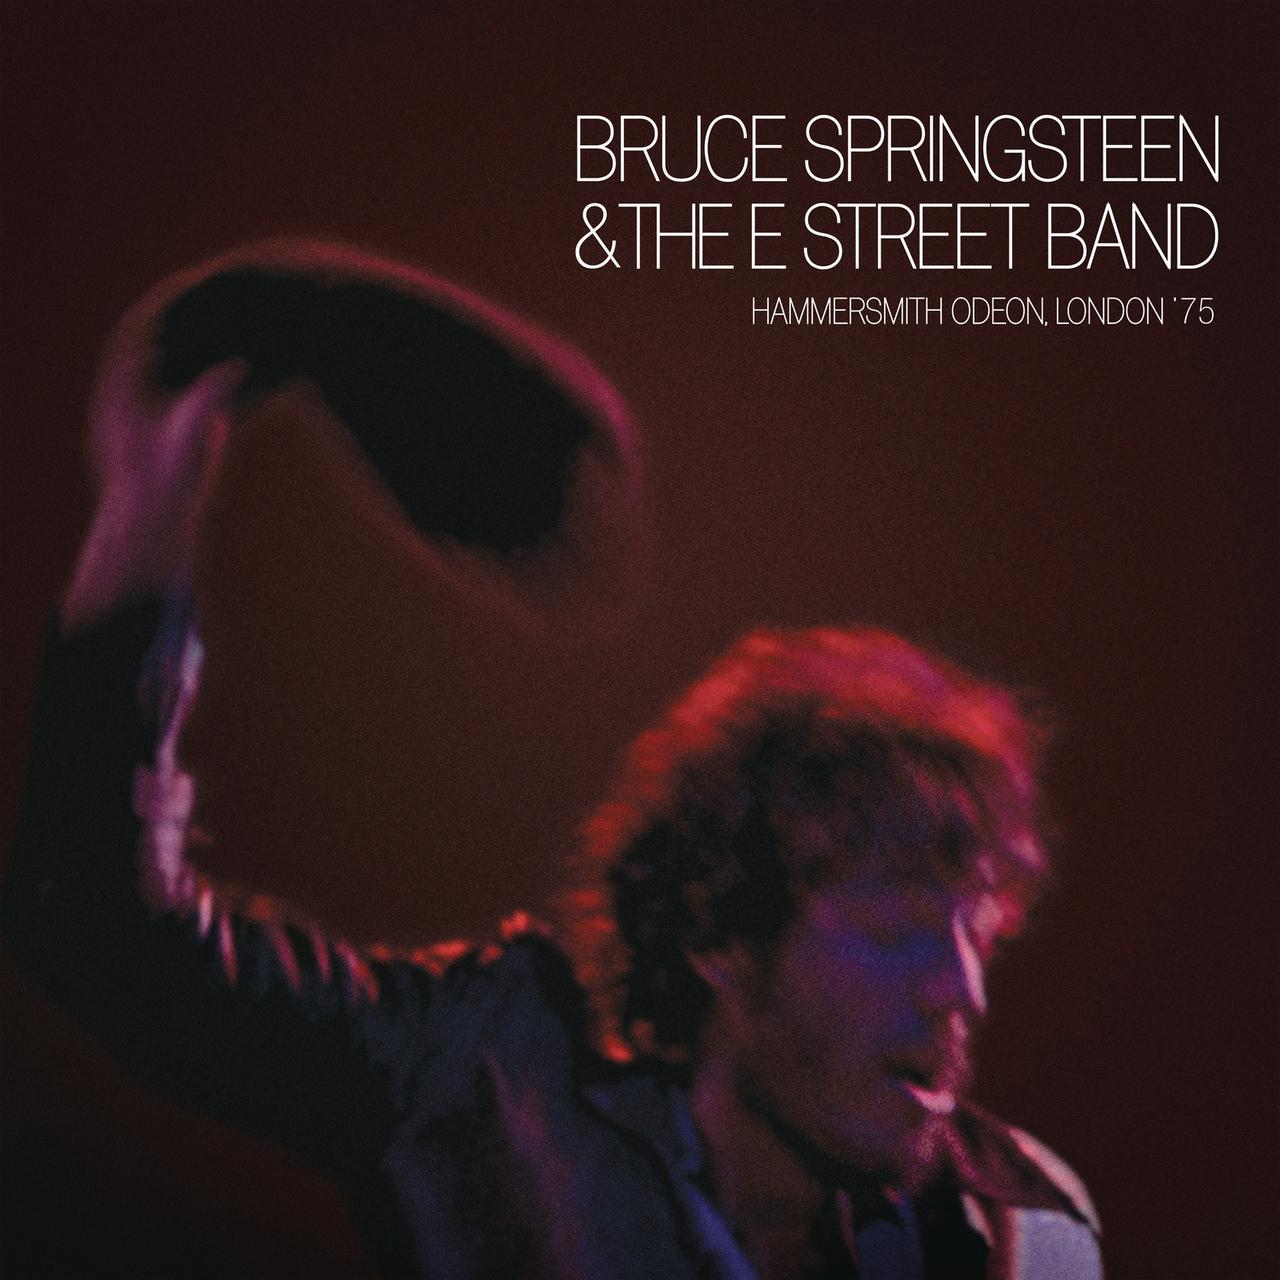 Bruce Springsteen Hammersmith Odeon London 75 Vinyl Record